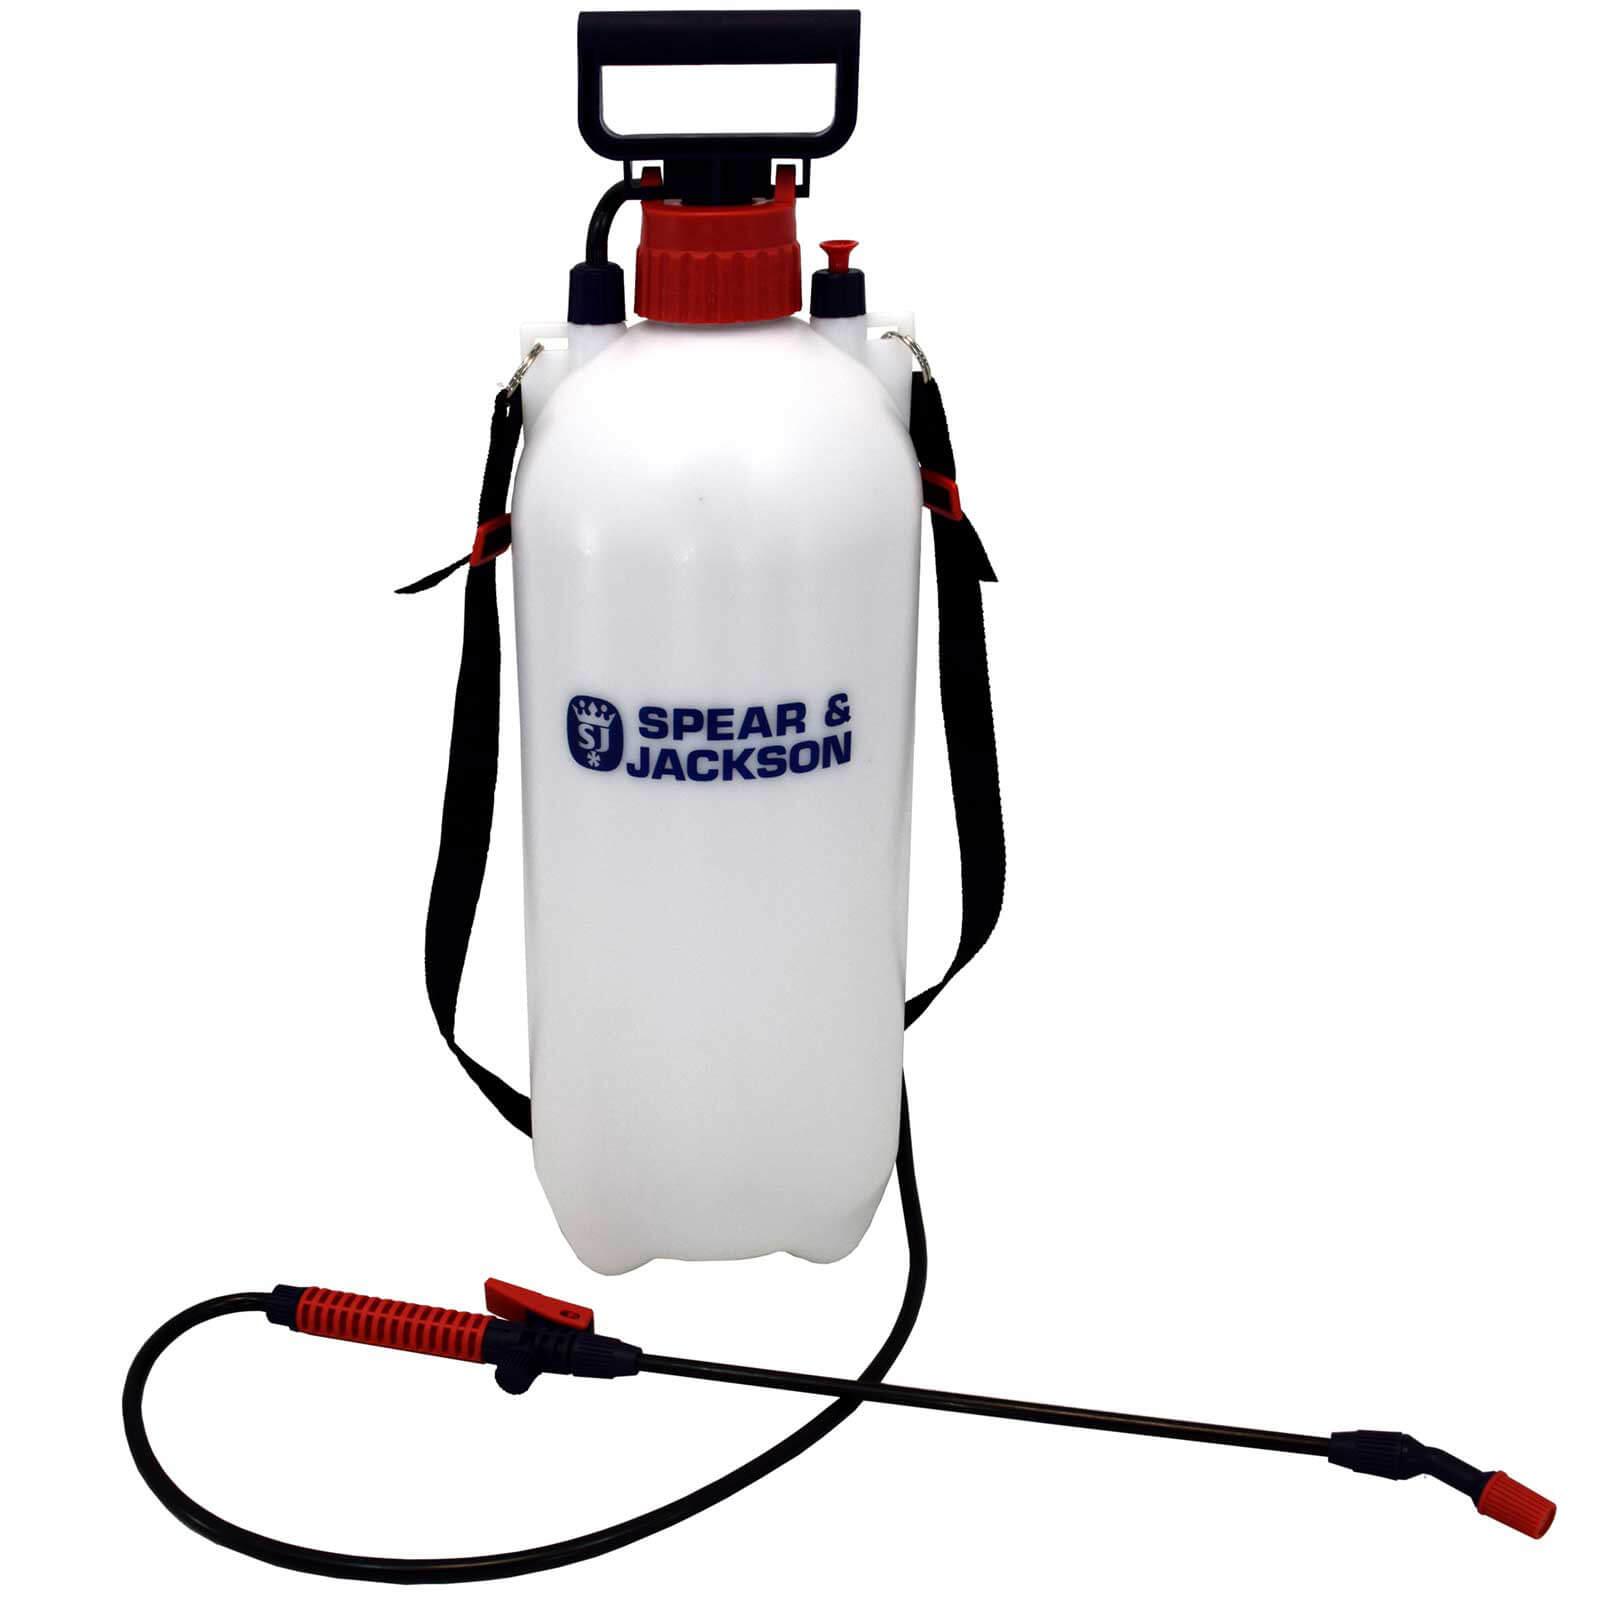 Spear and Jackson Pump Action Pressure Sprayer 8l